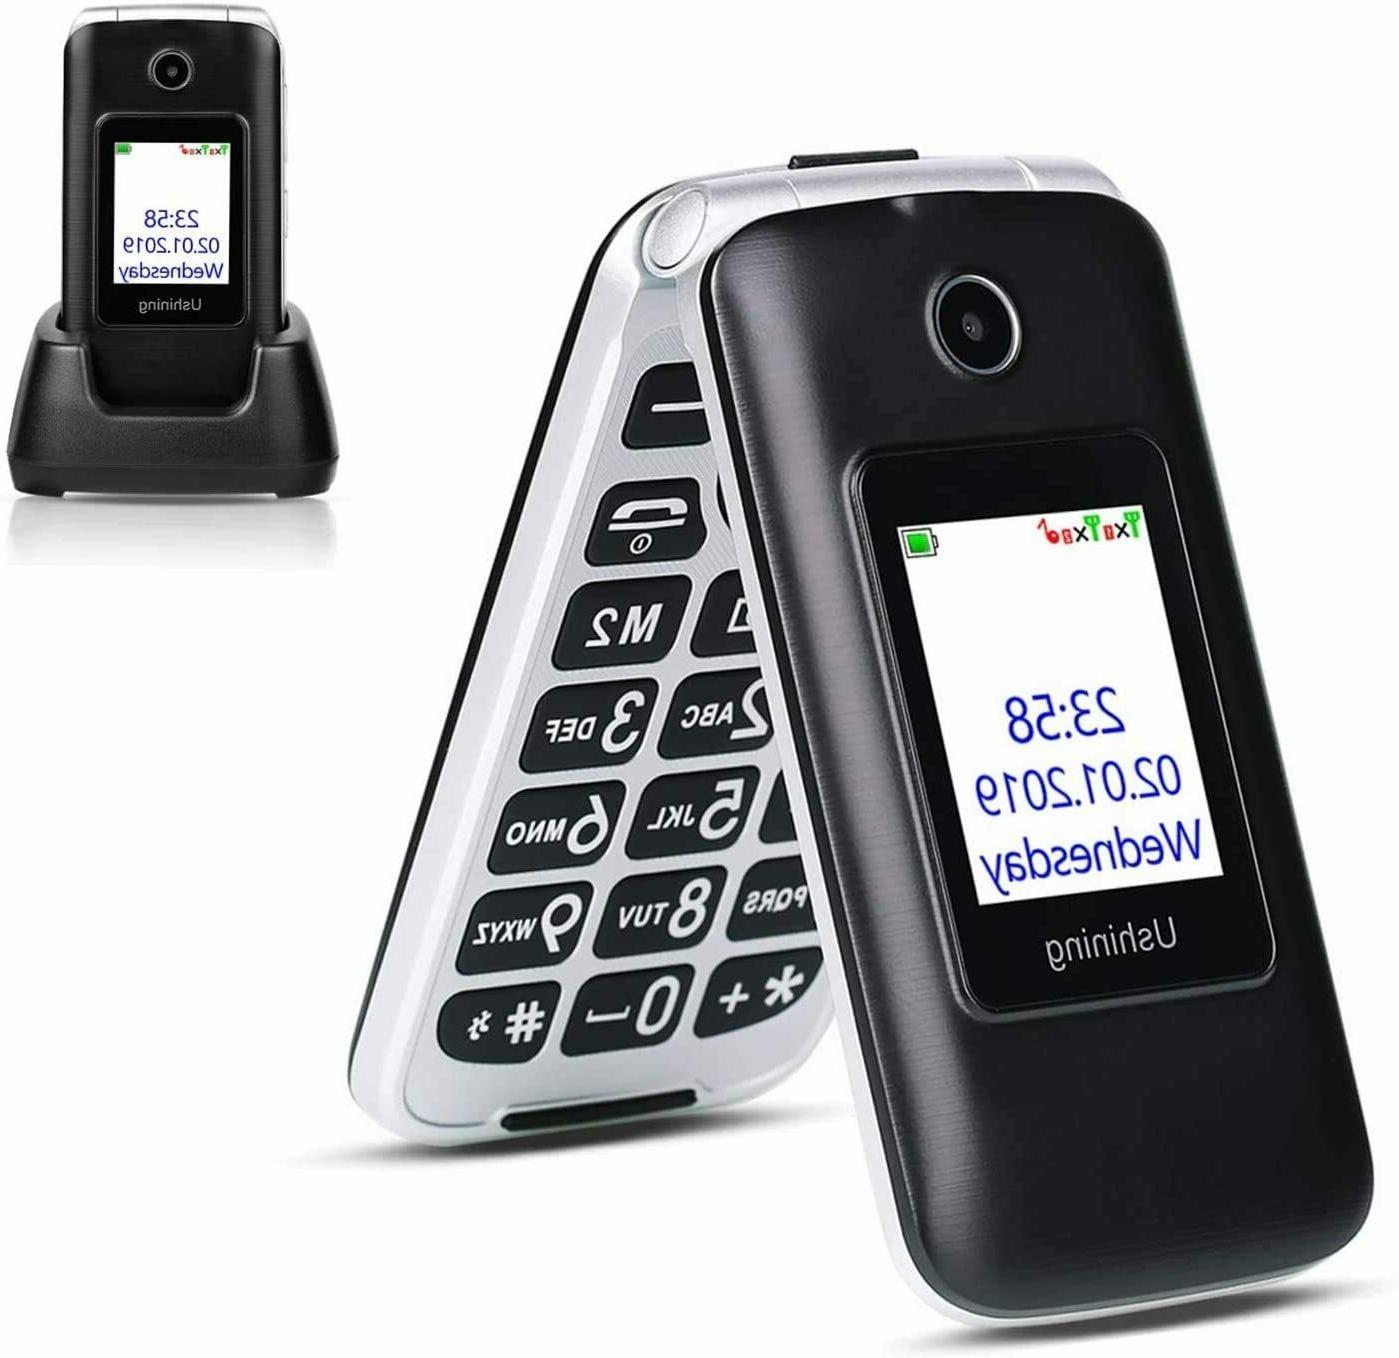 3g unlocked flip cell phone easy to